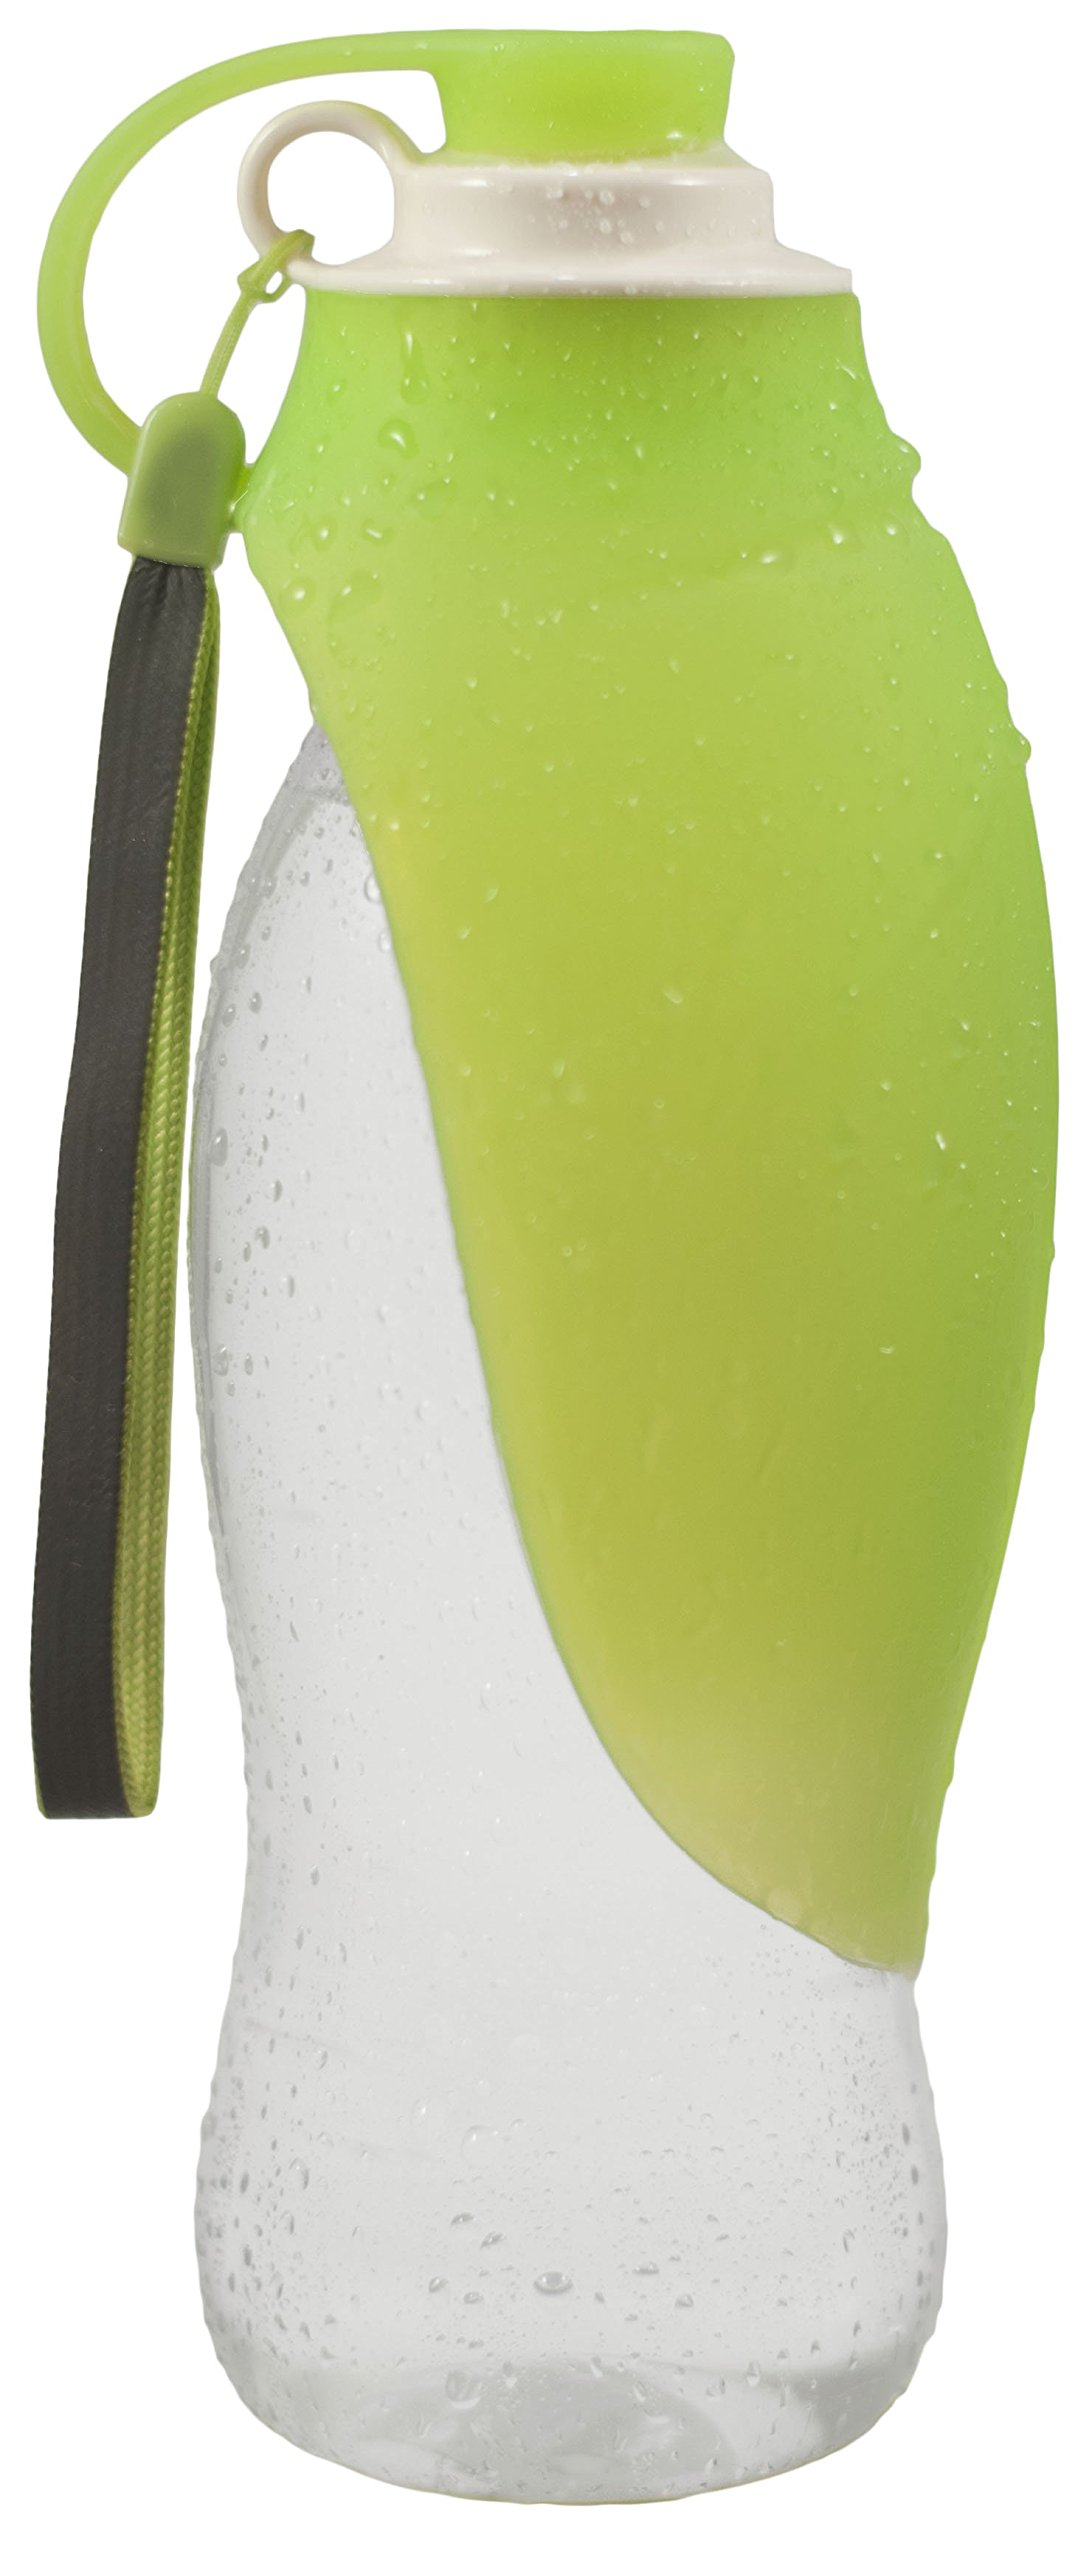 Ravensy Portable Dog Water Dispenser - 20oz Pet Water Bottle with Foldable Cap for Travel, Hiking, Walking, Jogging